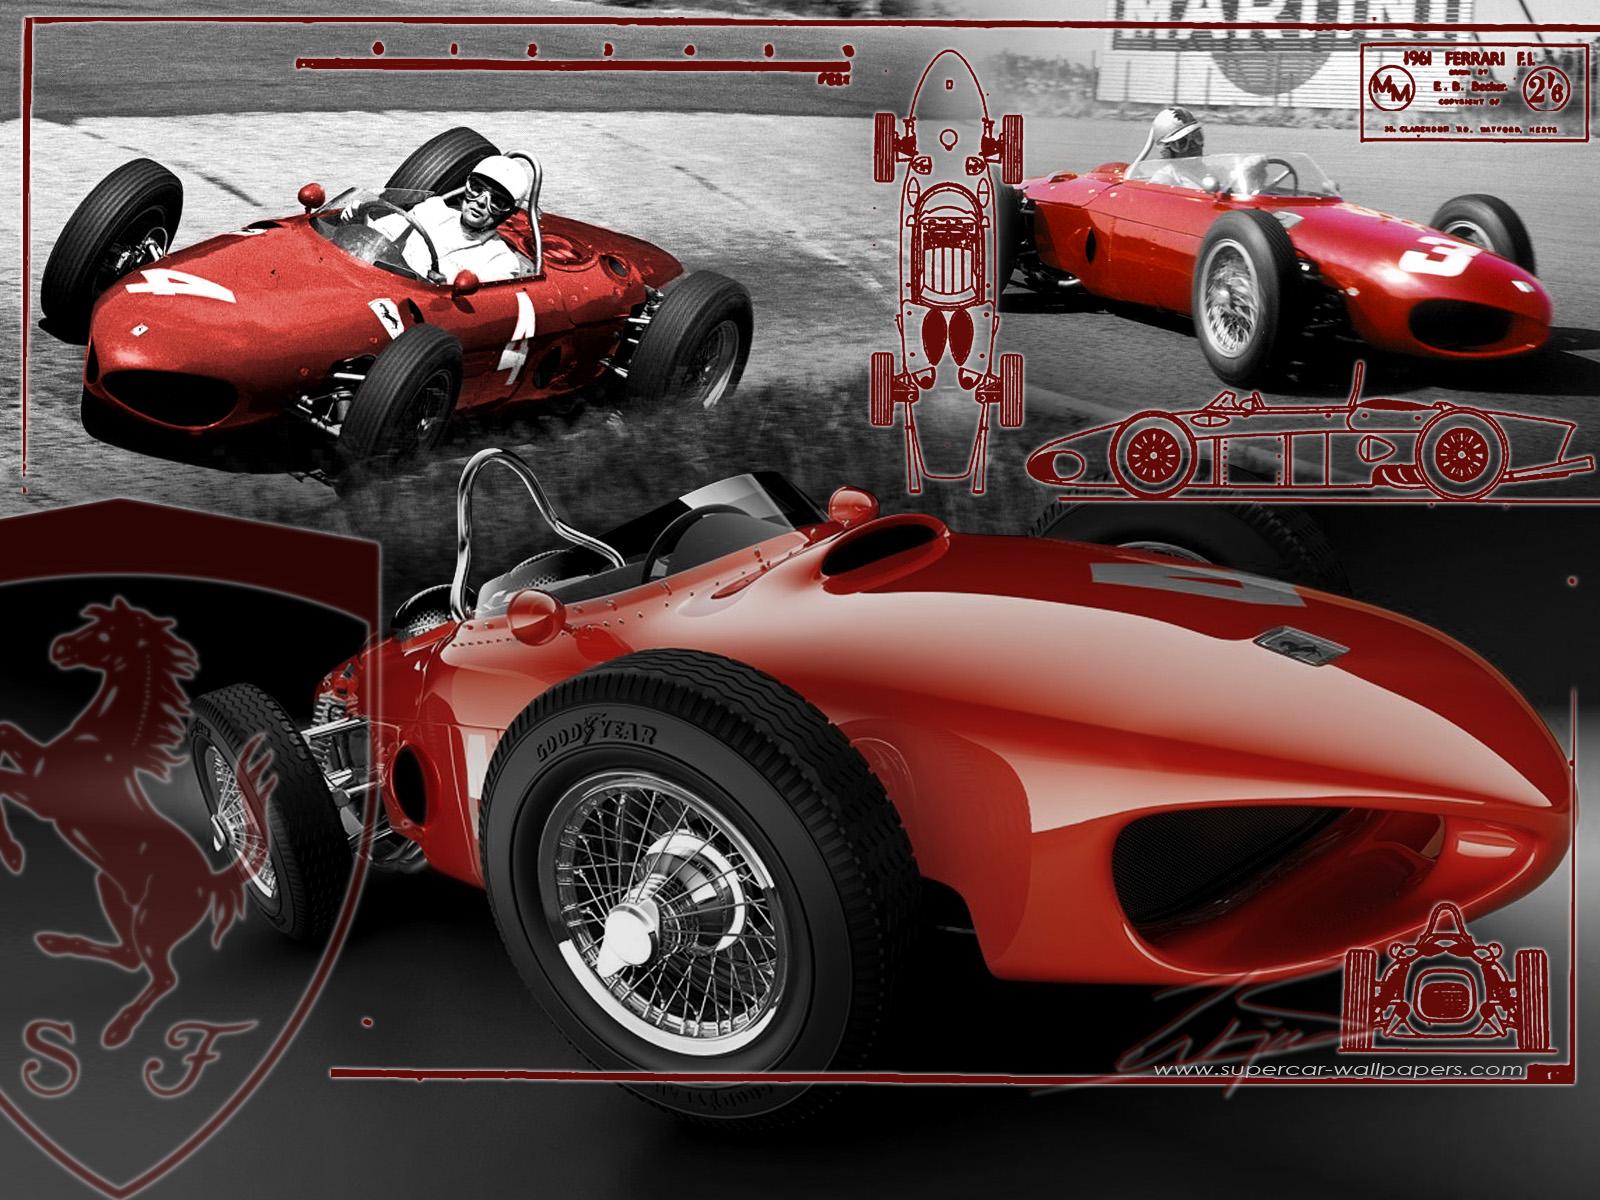 http://2.bp.blogspot.com/-IMWqfwPovv8/Tp00r4gxeJI/AAAAAAAAAMc/HyDyjnxAlGg/s1600/Ferrari+156+F1+Sharknose_1600.jpg